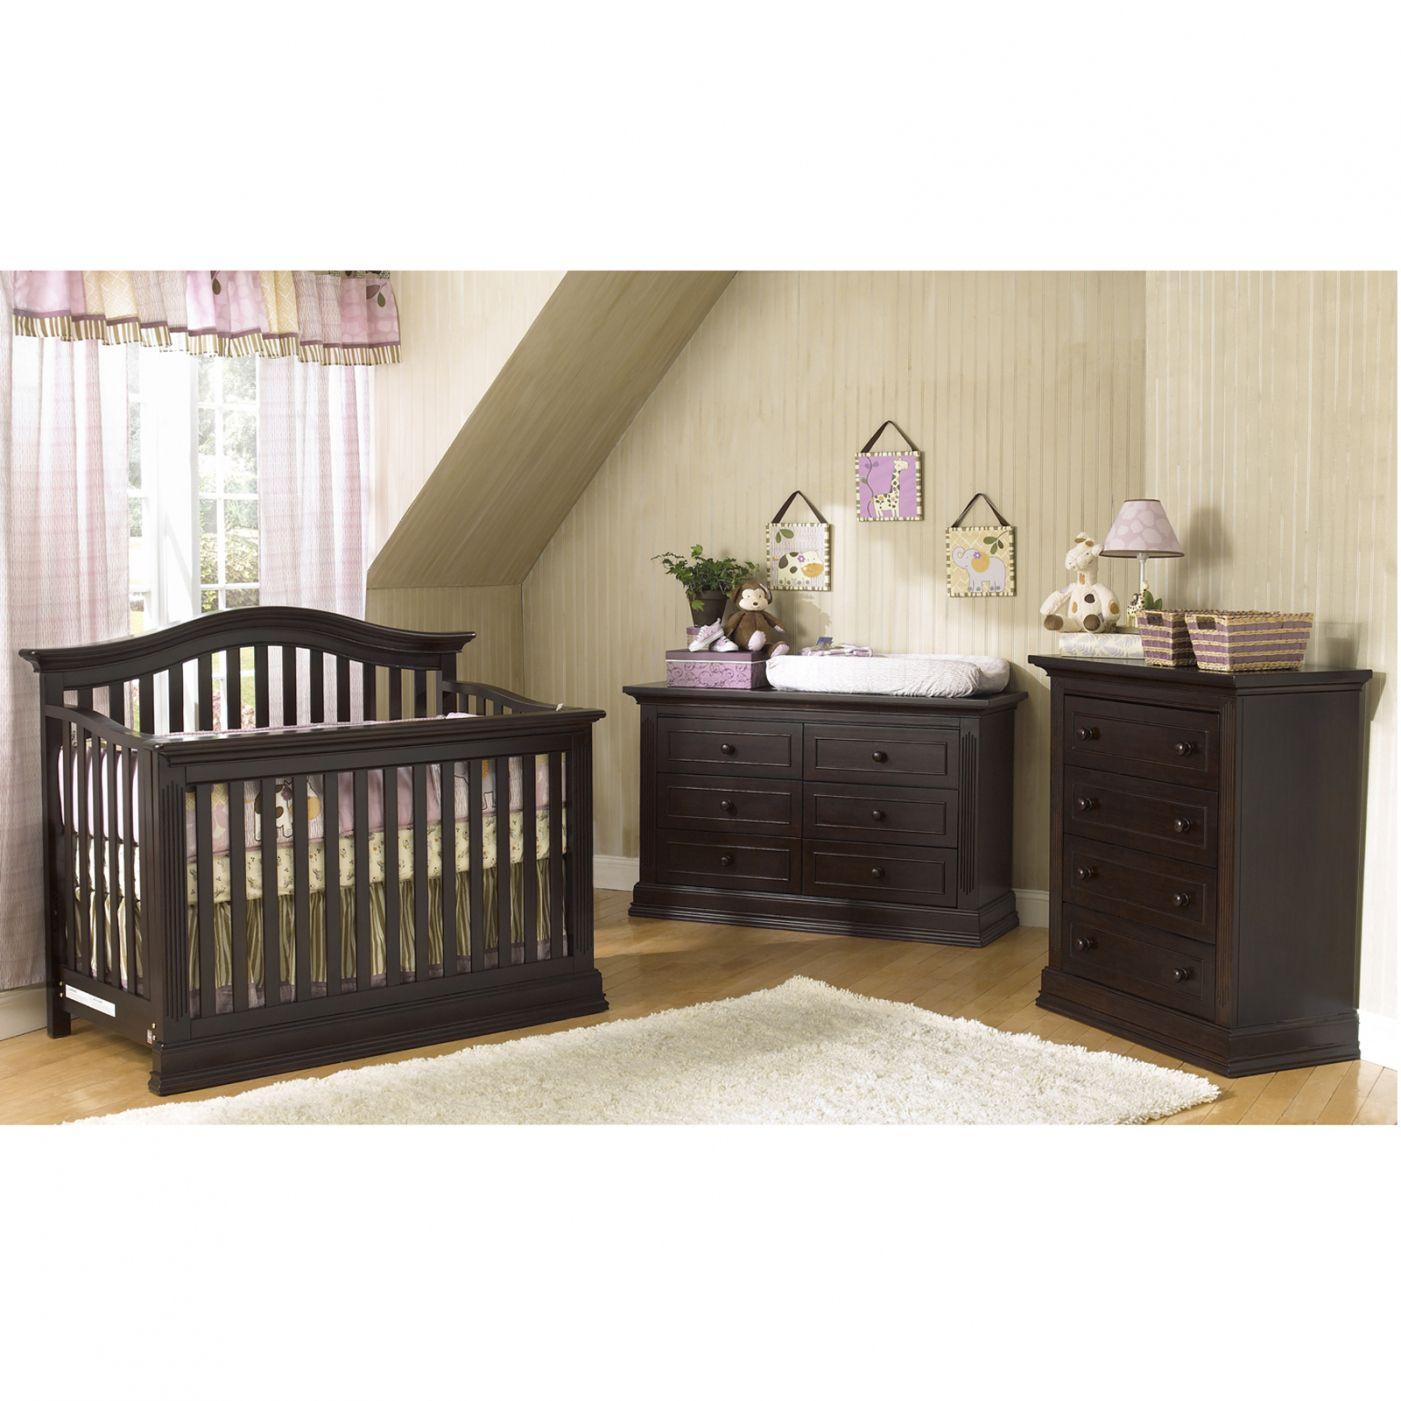 Ba Crib Bedding At Burlington Coat Factory Best Cribs In Size 2000 X 1635 Baby